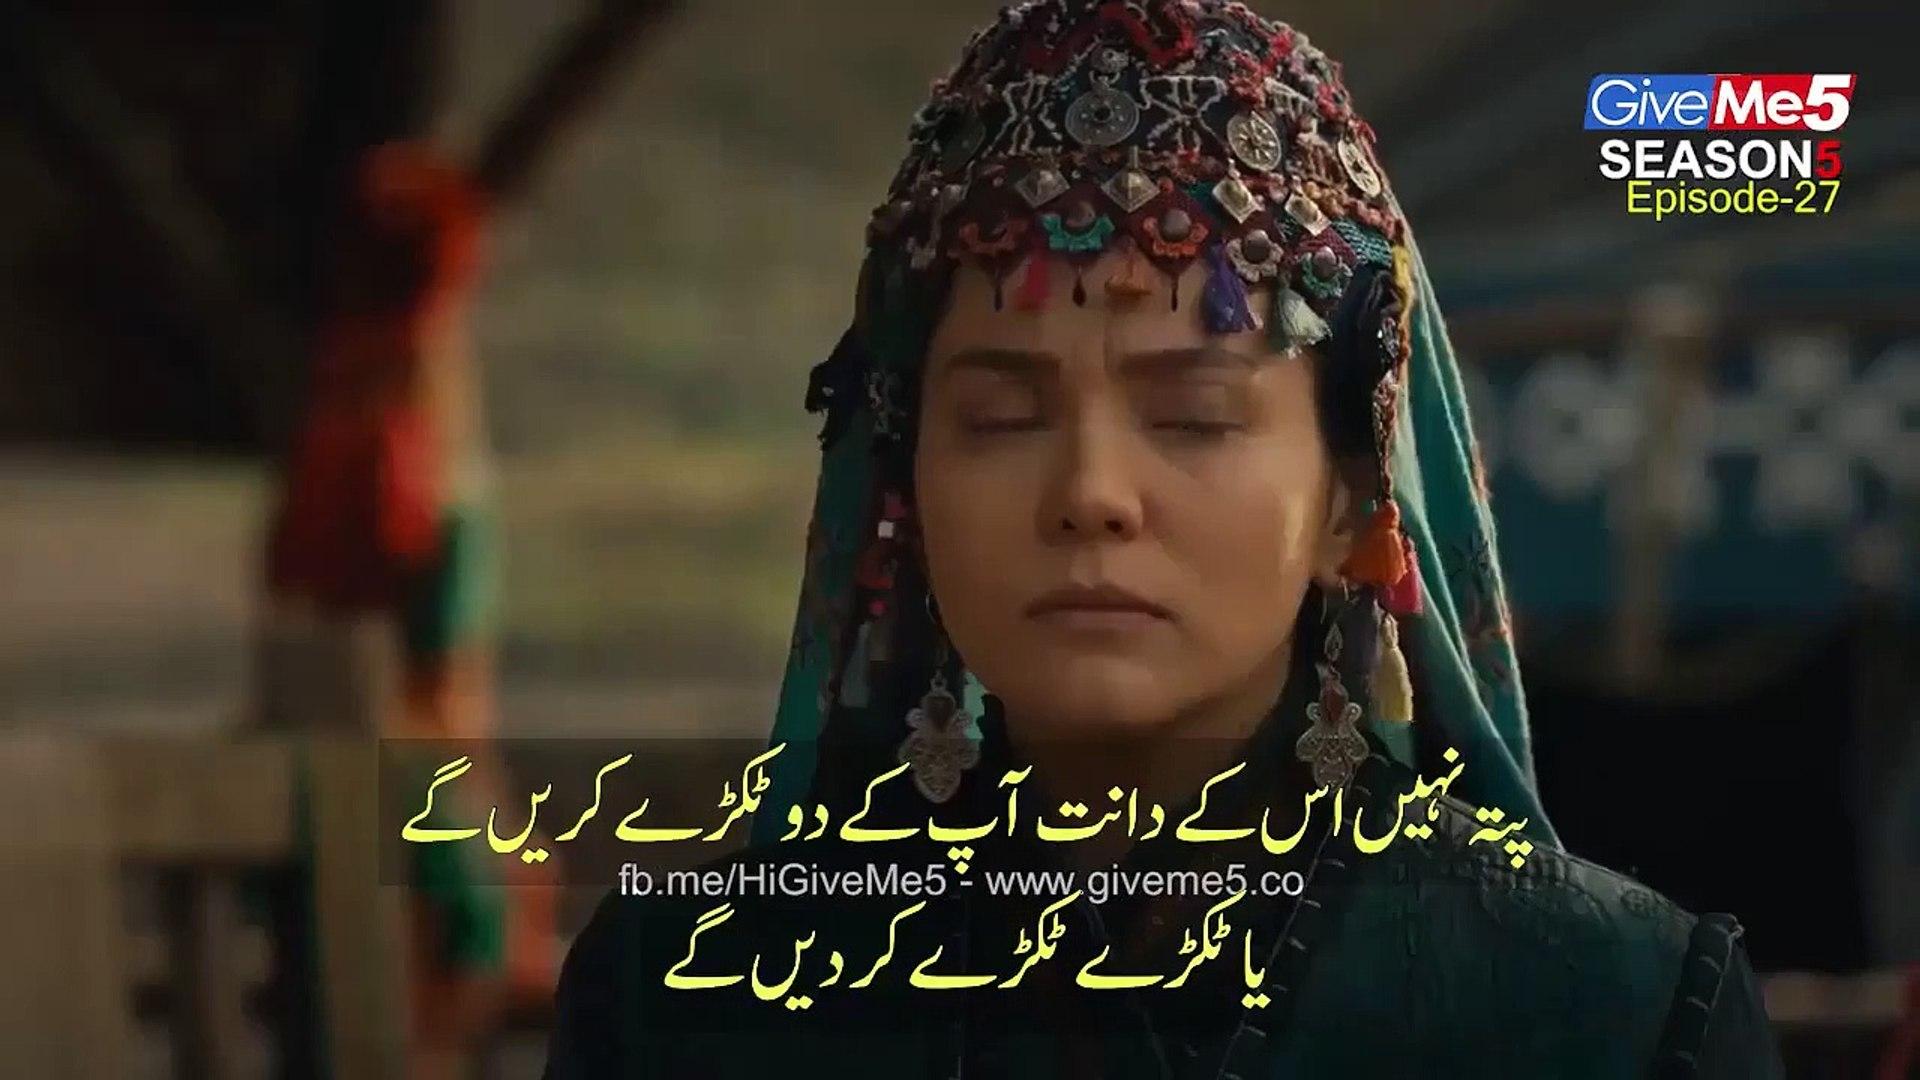 Dirilis Ertugrul Ghazi Season 5 in Urdu Subtitle Episode 27 & 28